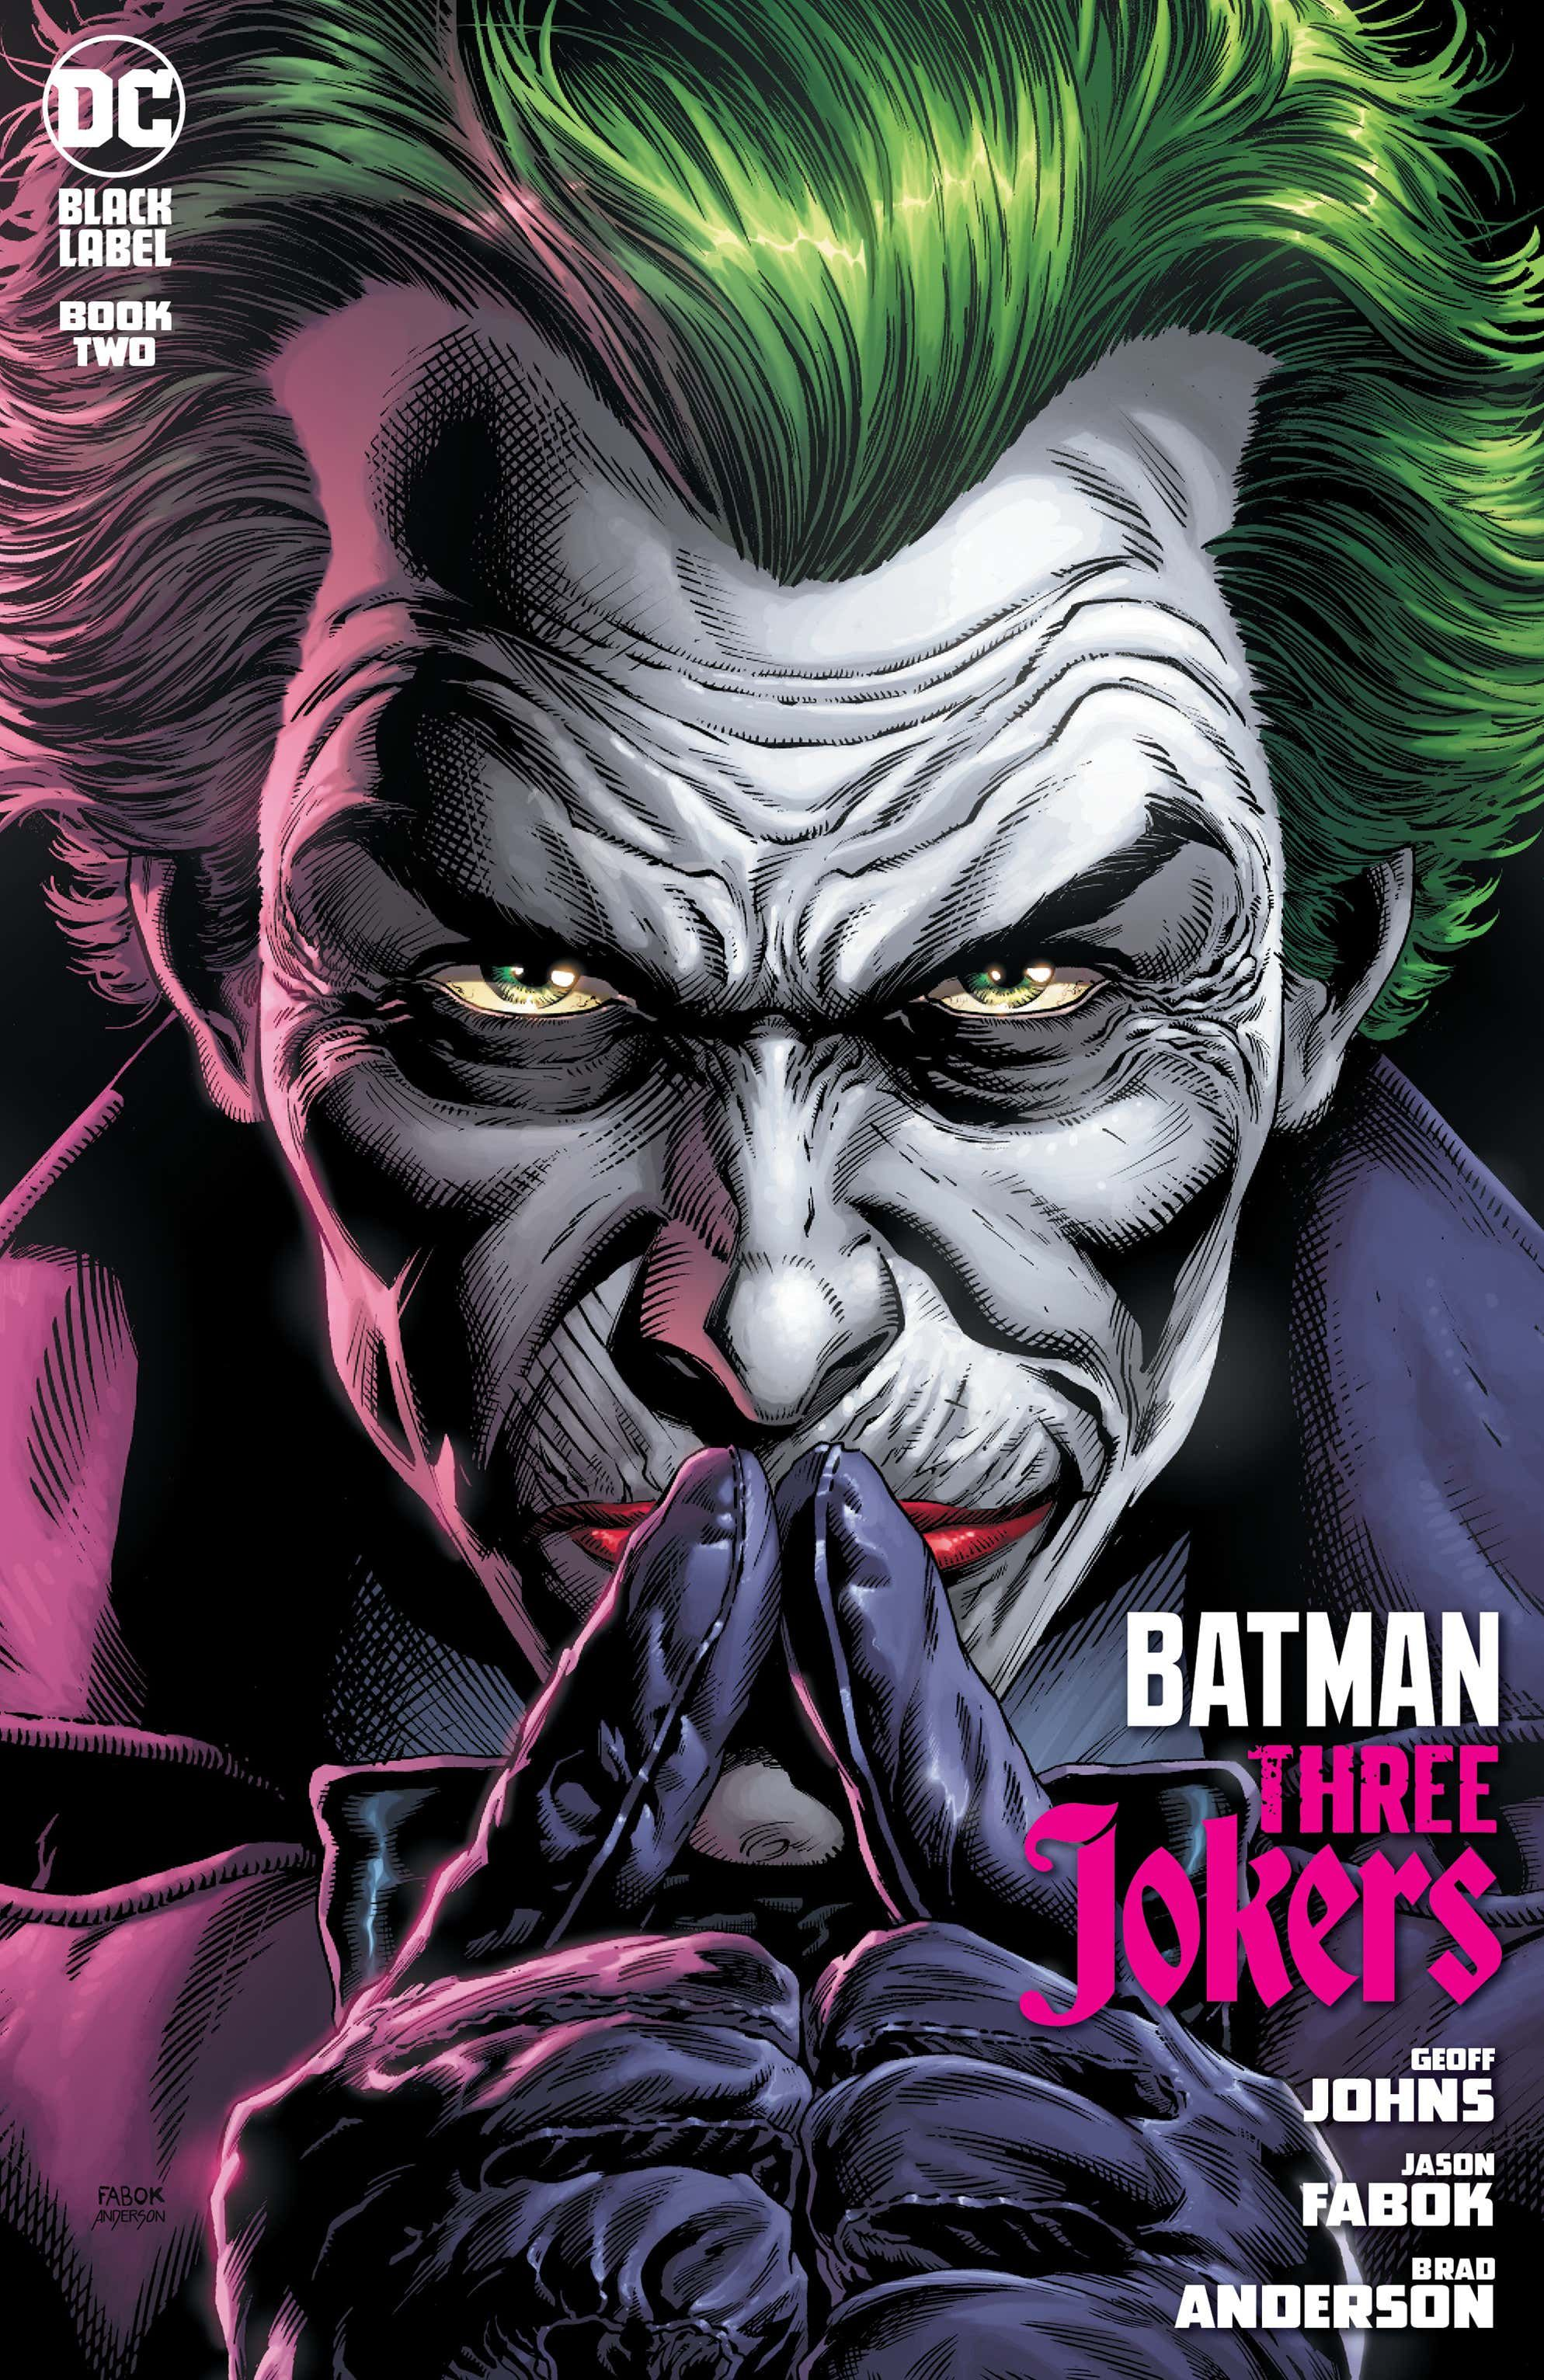 Batman Three Jokers 2 Of 3 Joker Comic Three Jokers Joker Artwork